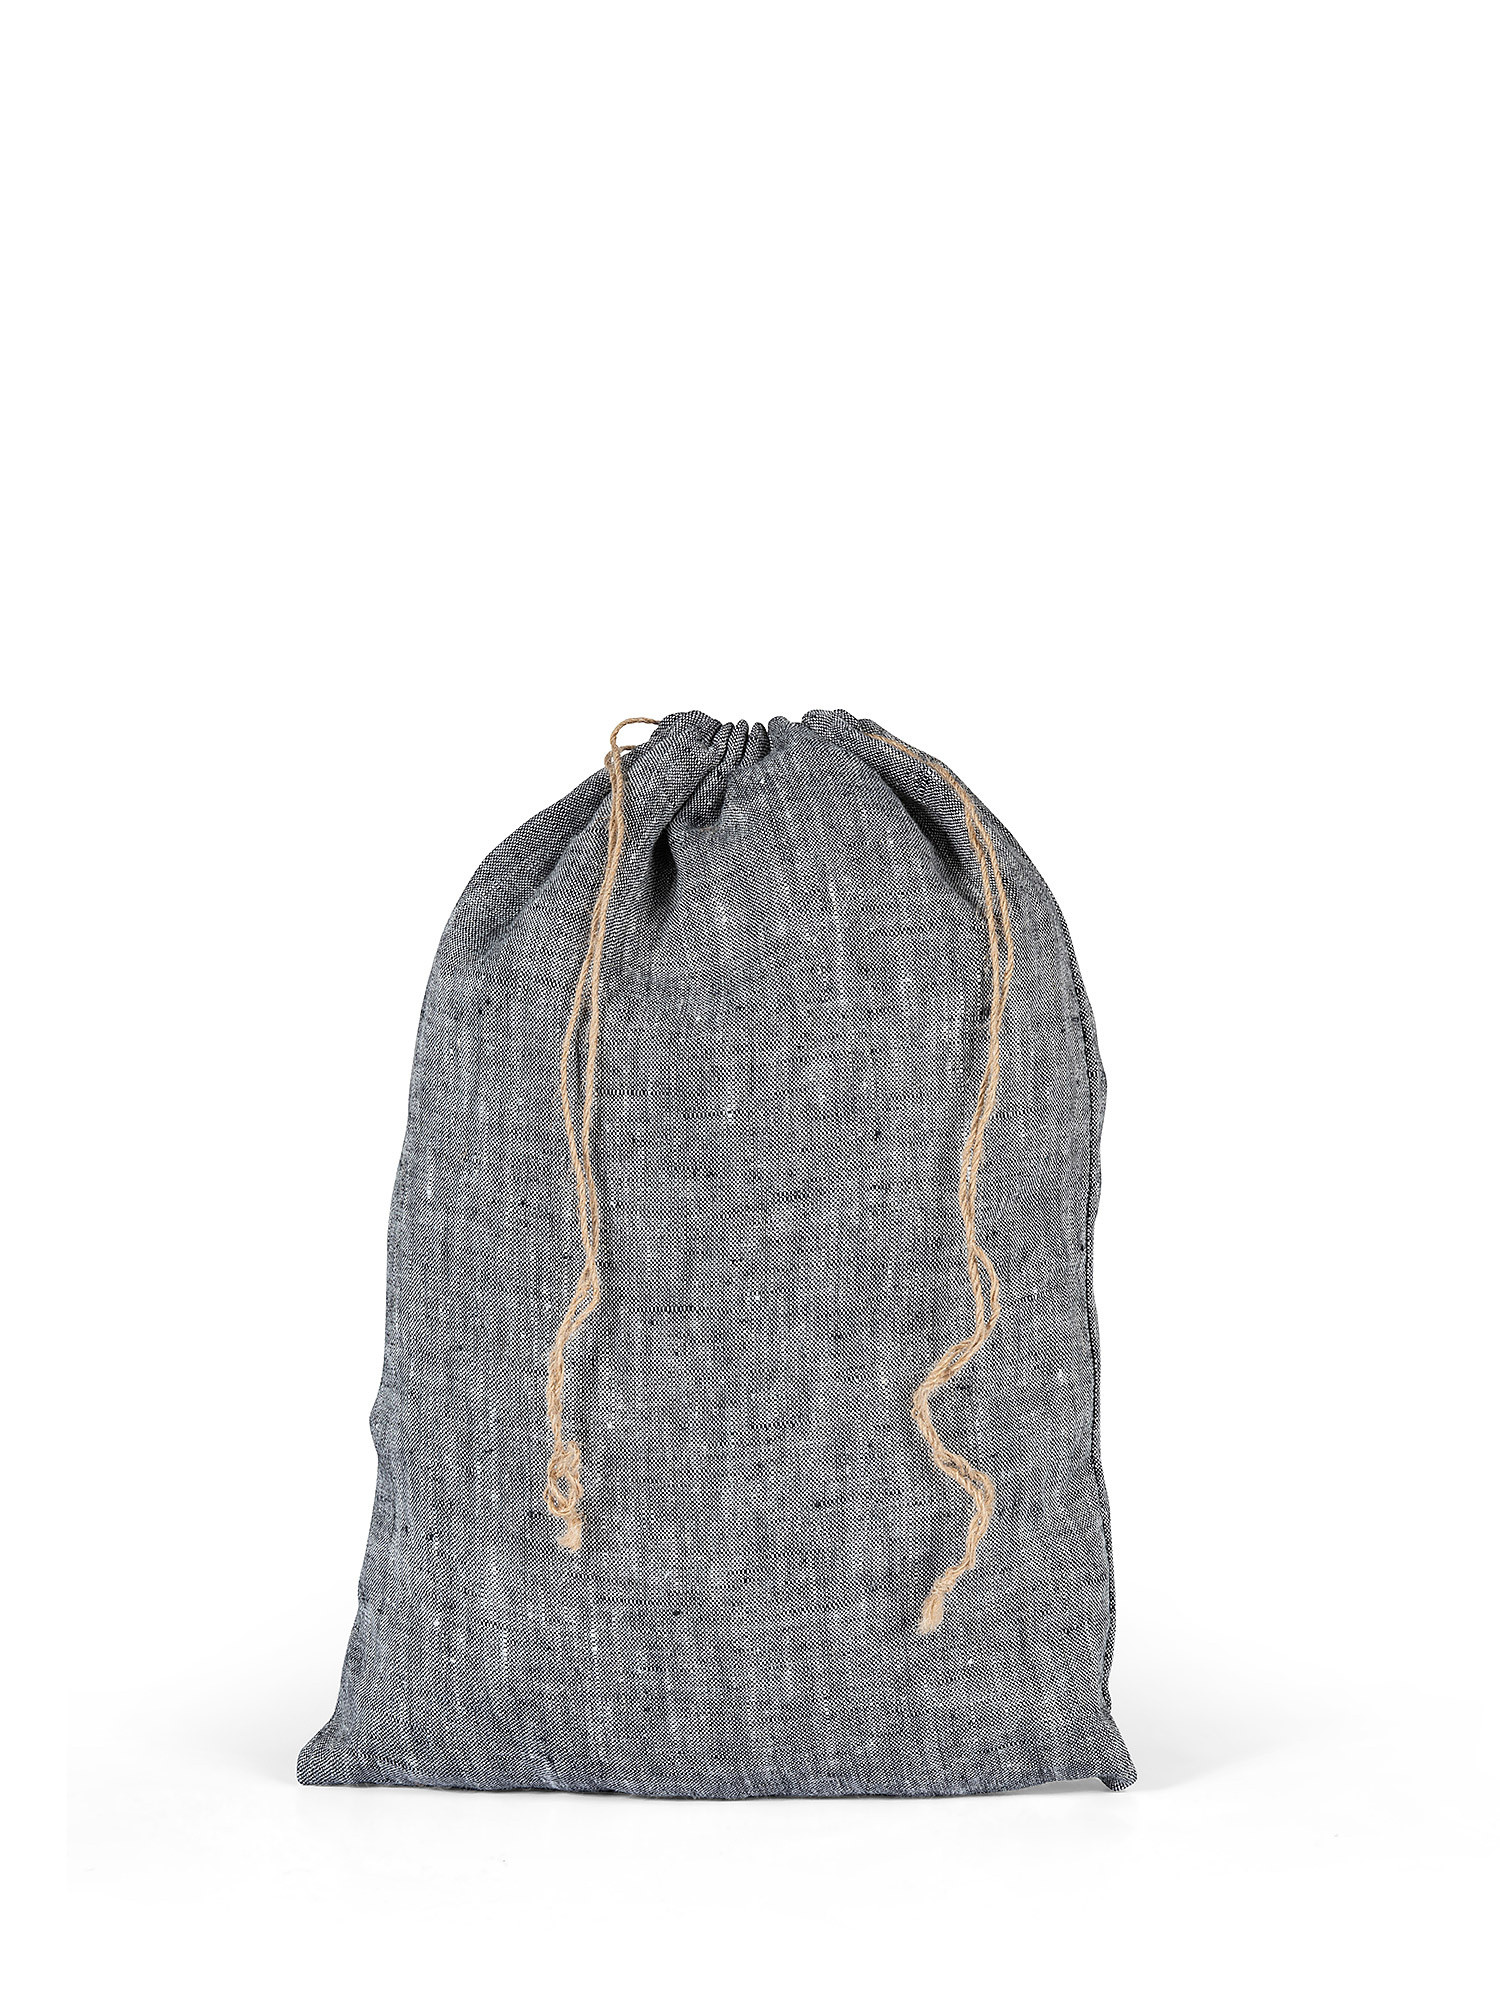 Sacchettino lino lavato tinta unita, Grigio, large image number 0